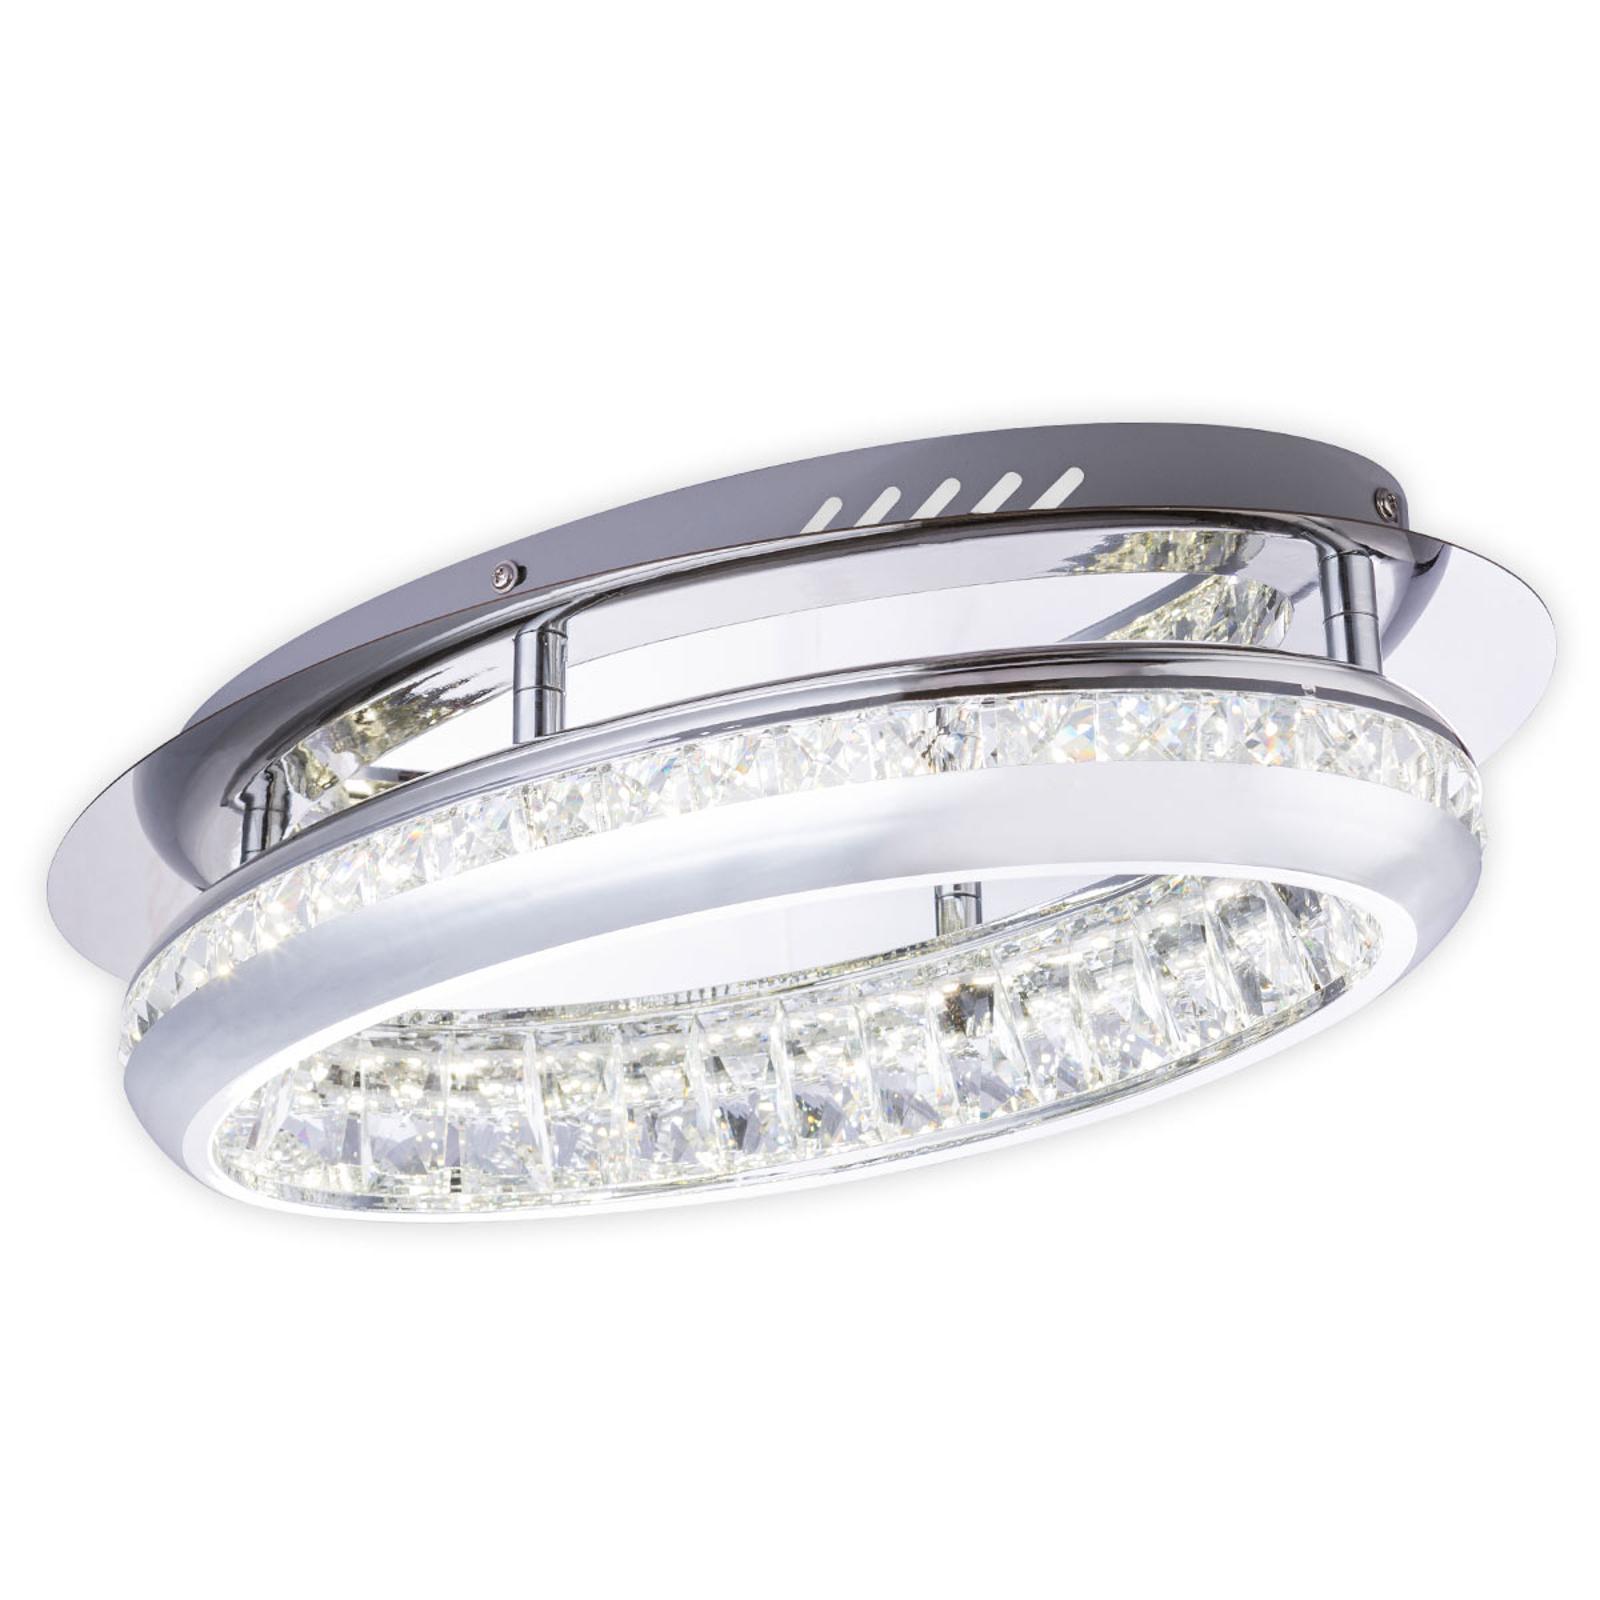 LED plafondlamp 67096-18 met kristallen, chroom